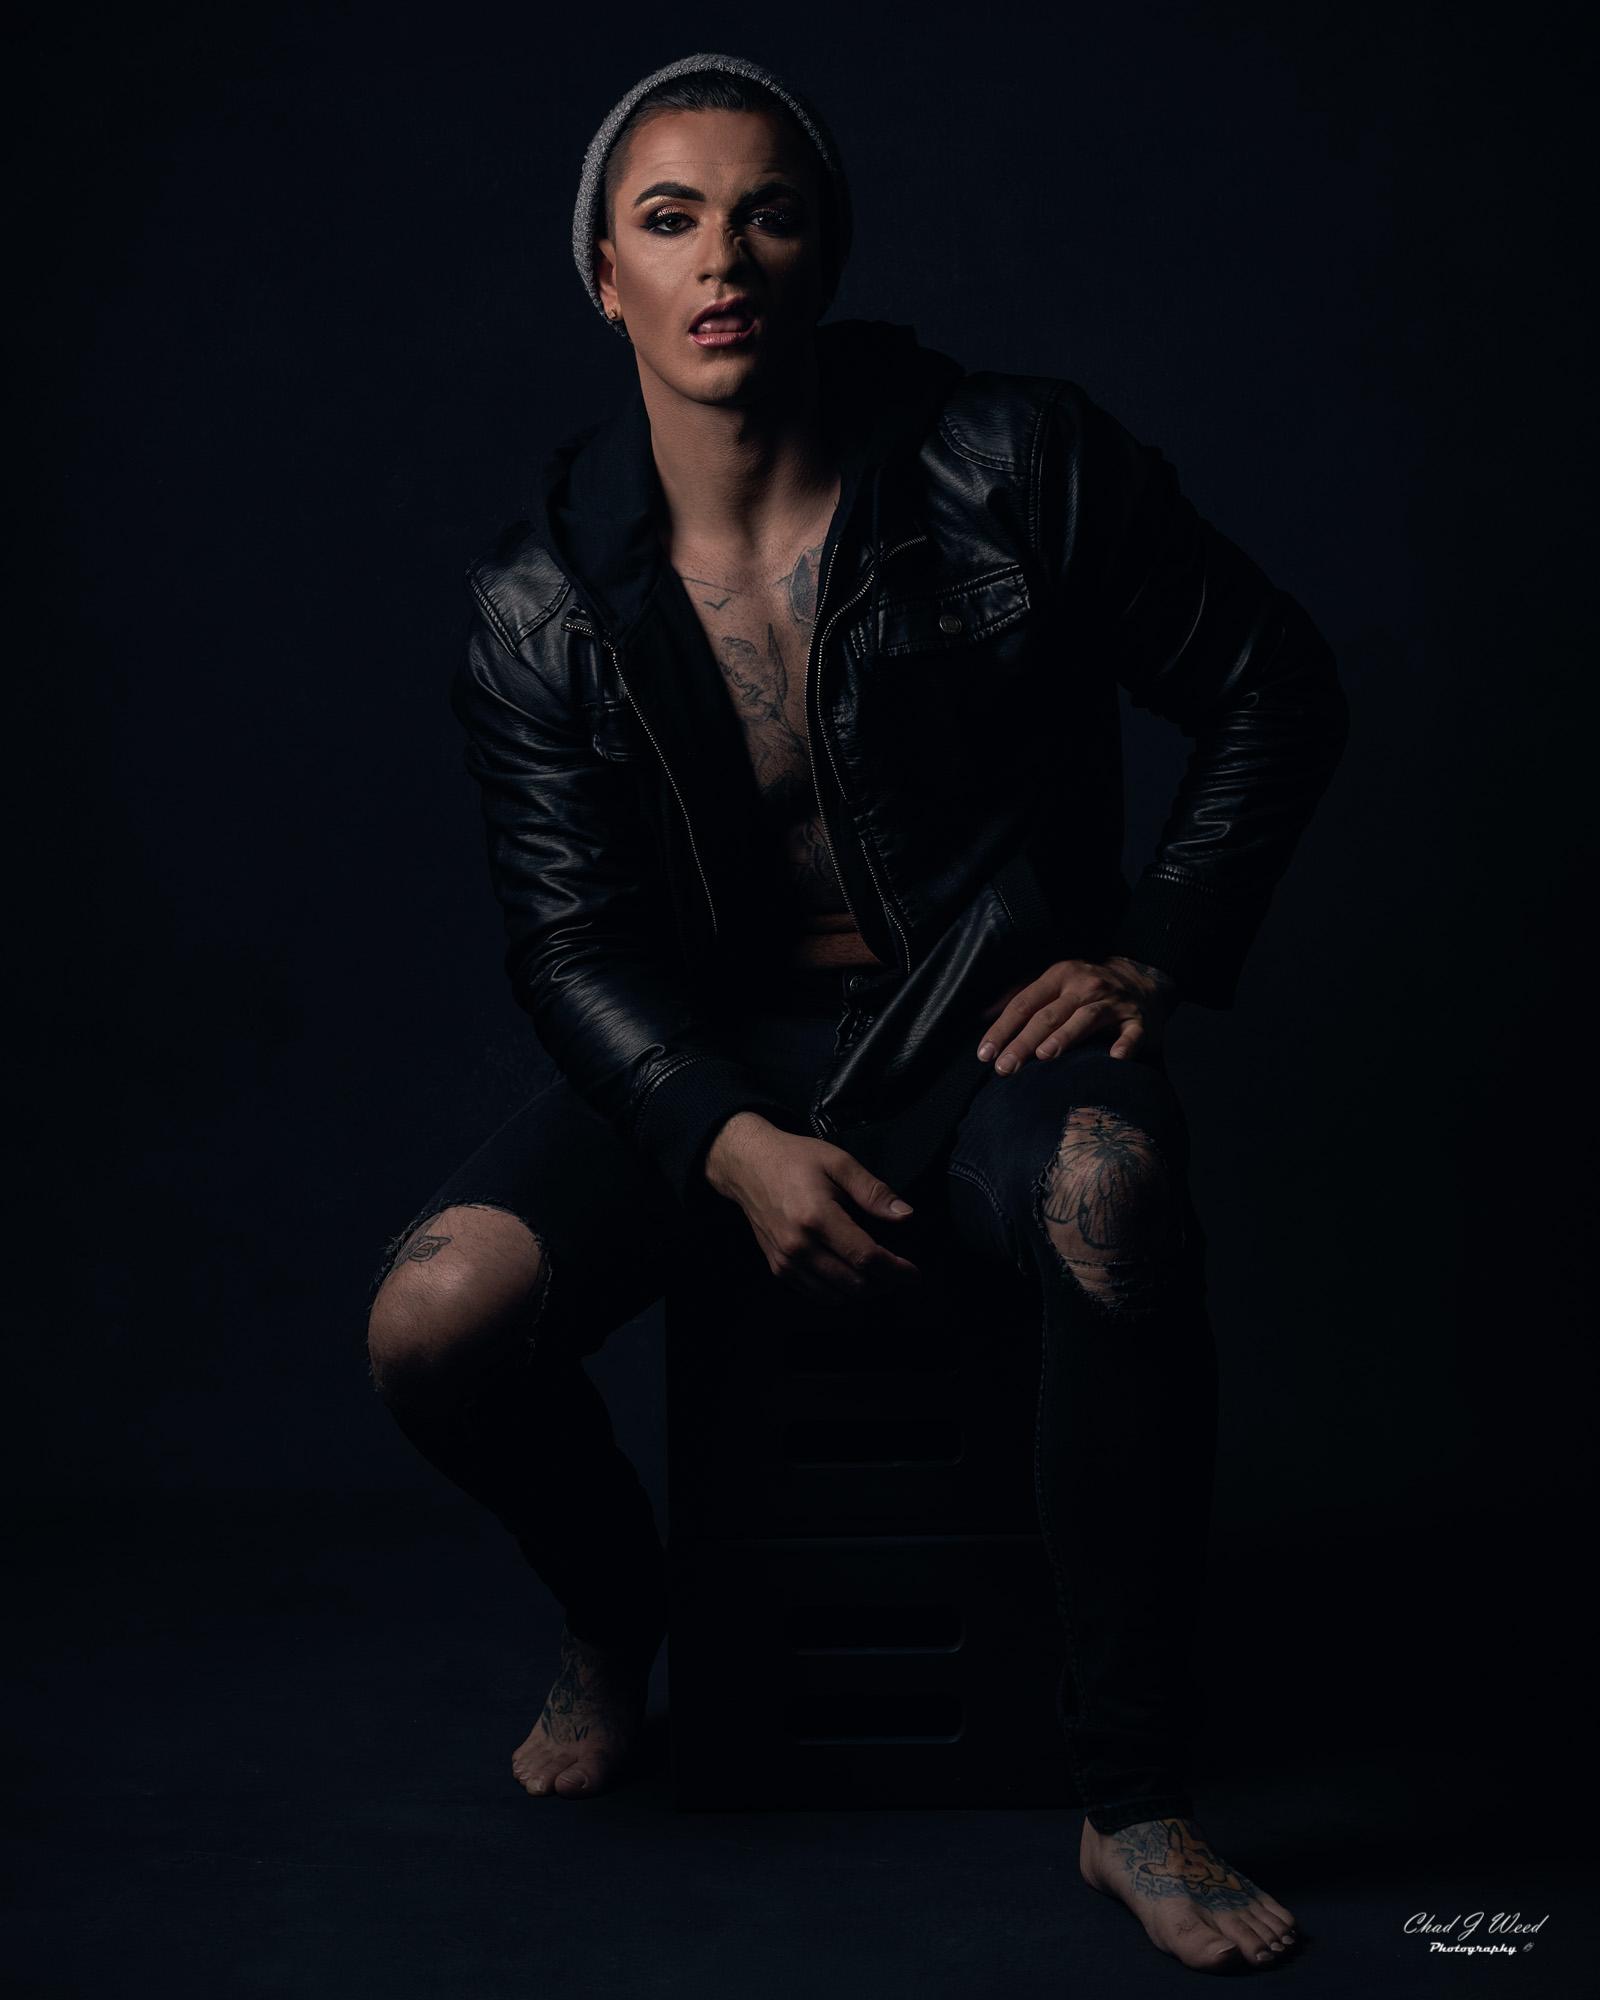 Arizona Glamour Portrait Photographer Chad Weed with Fitness Bad Boy Isaac